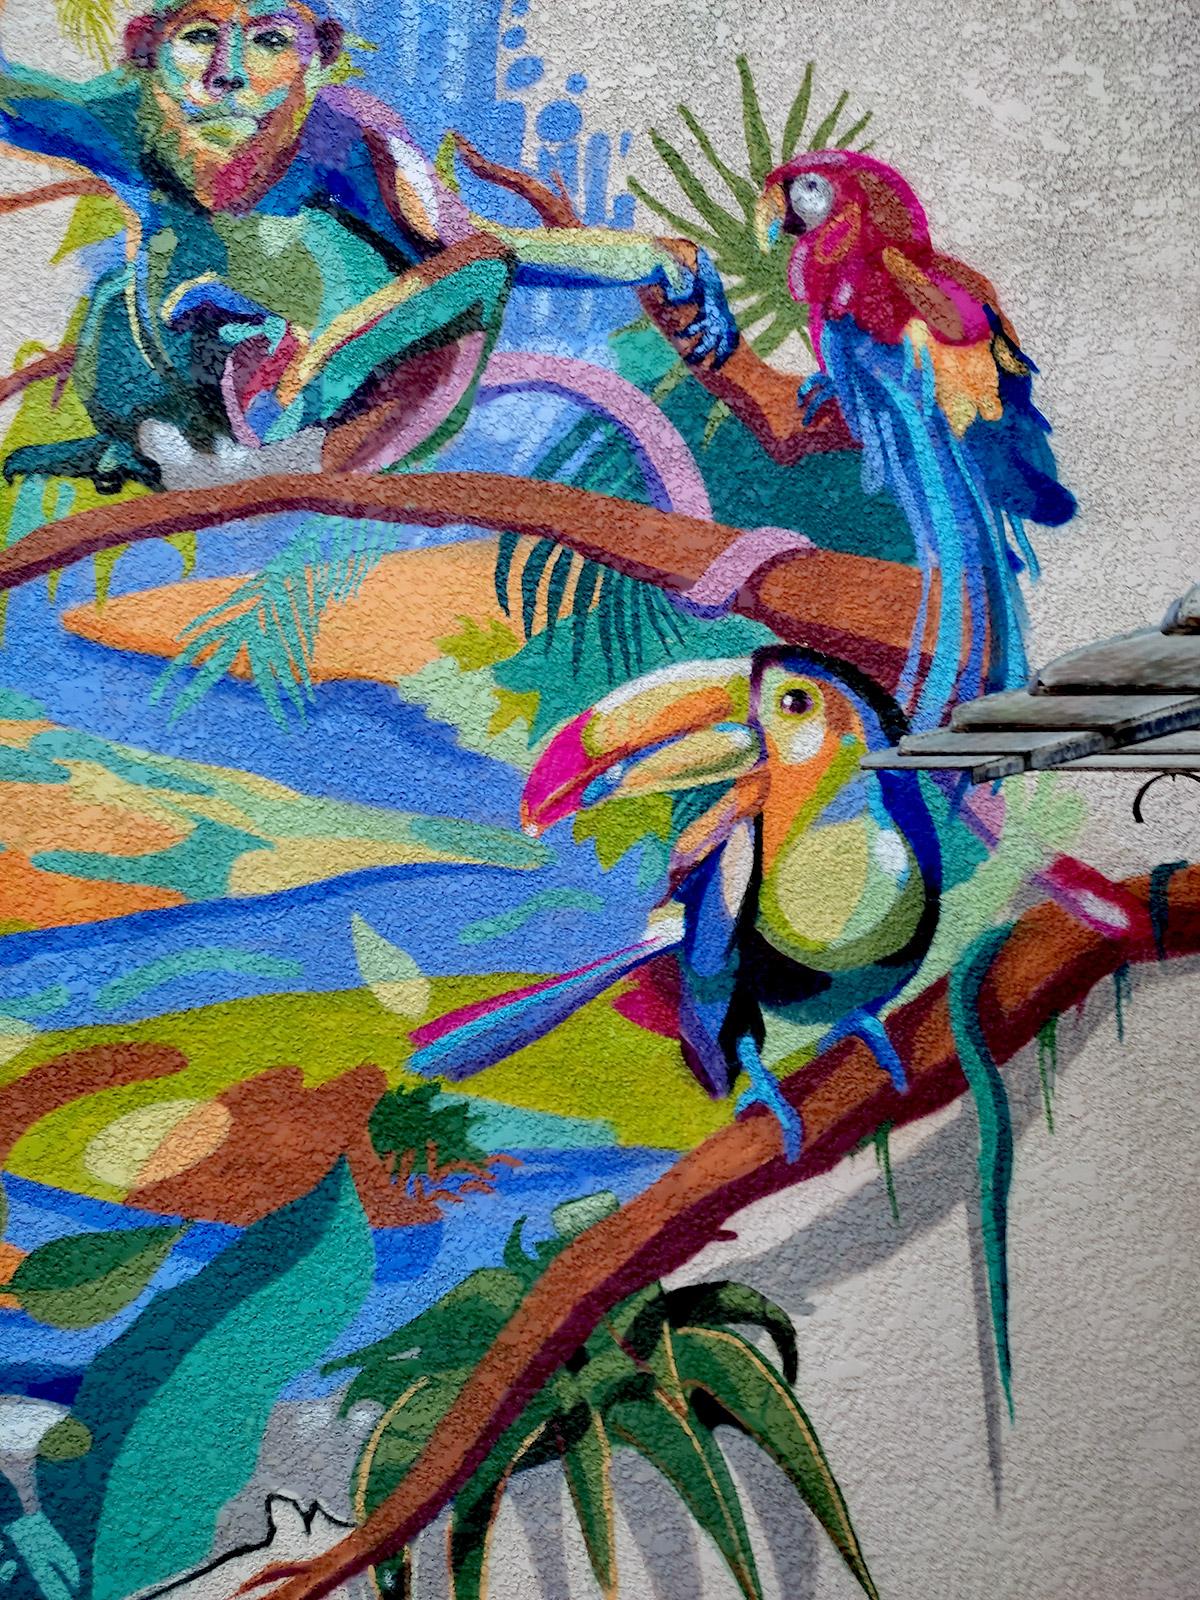 Perroquet, singe, oiseau en peinture street art fresque en France Par l'artiste Enkage